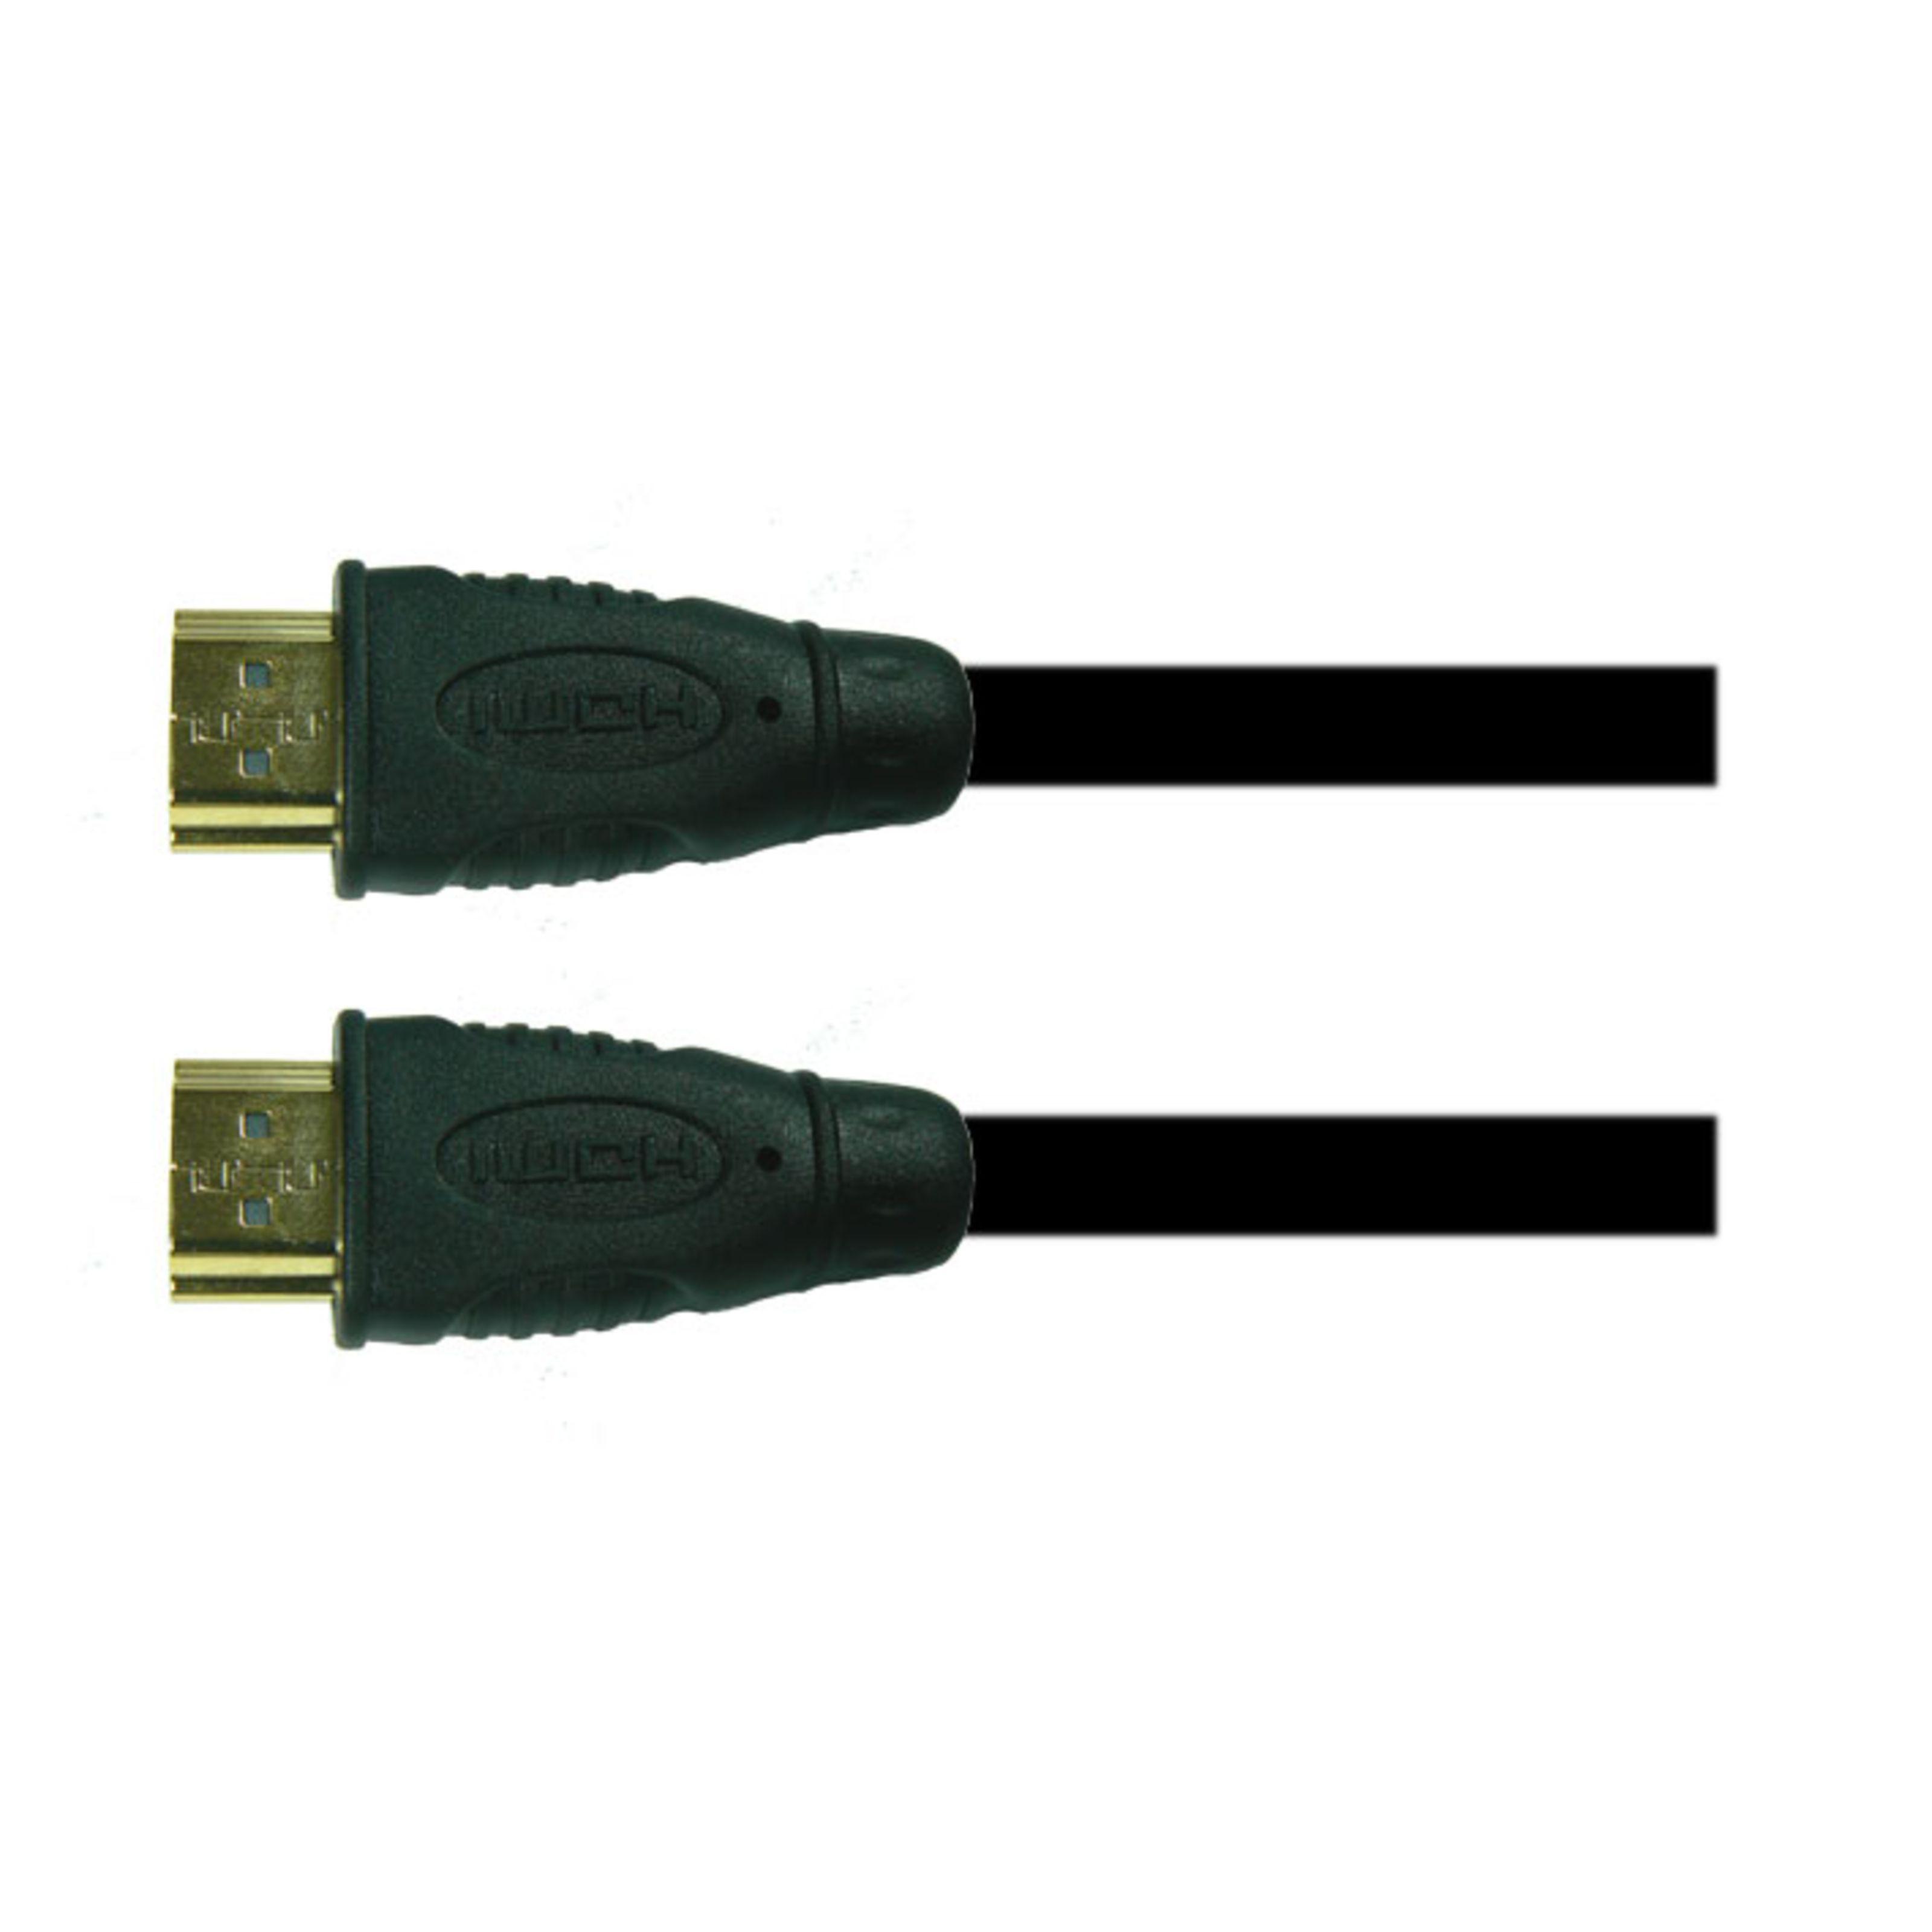 Schulzkabel - HDMI 3 Kabel 3 m